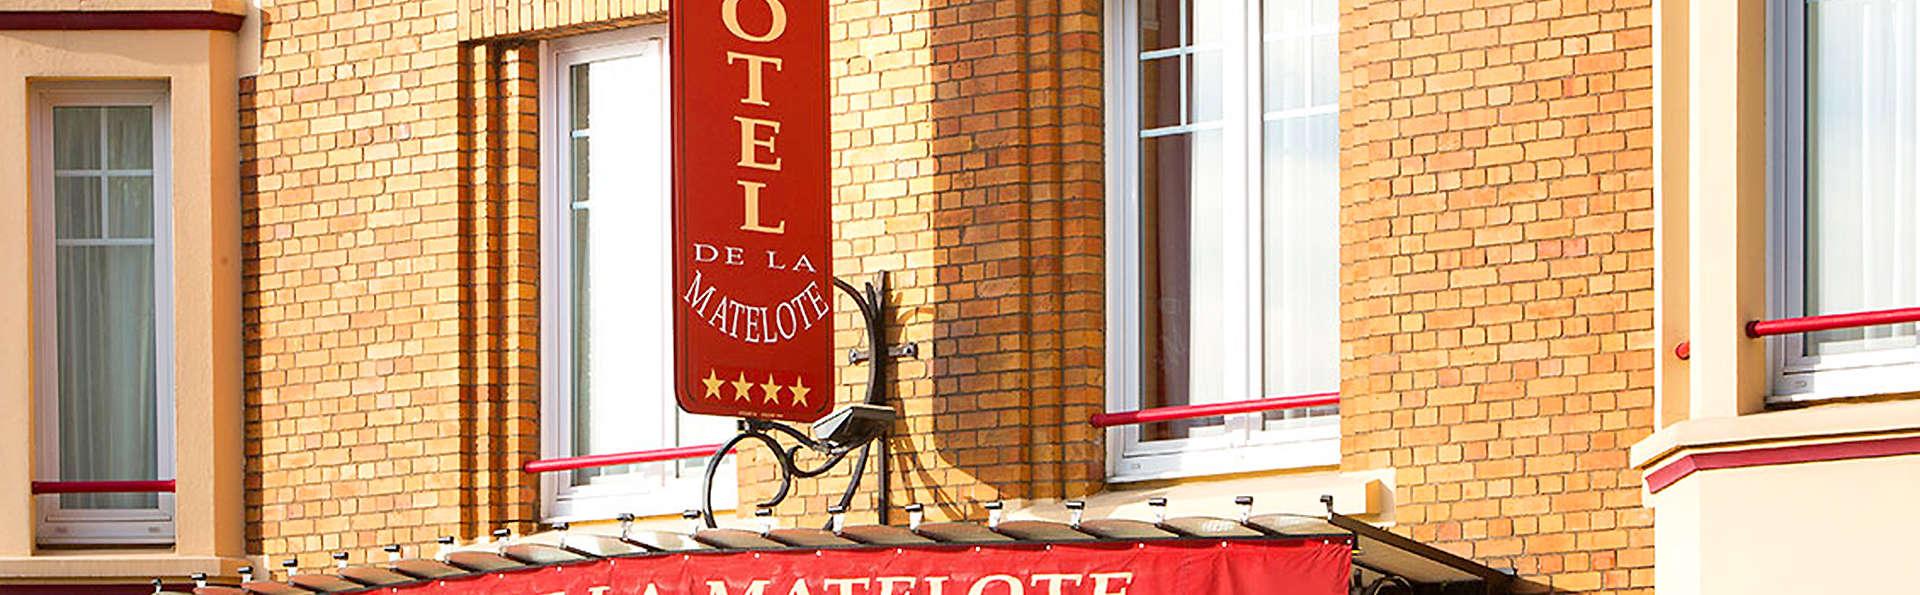 Hôtel La Matelote - EDIT_Exterior.jpg